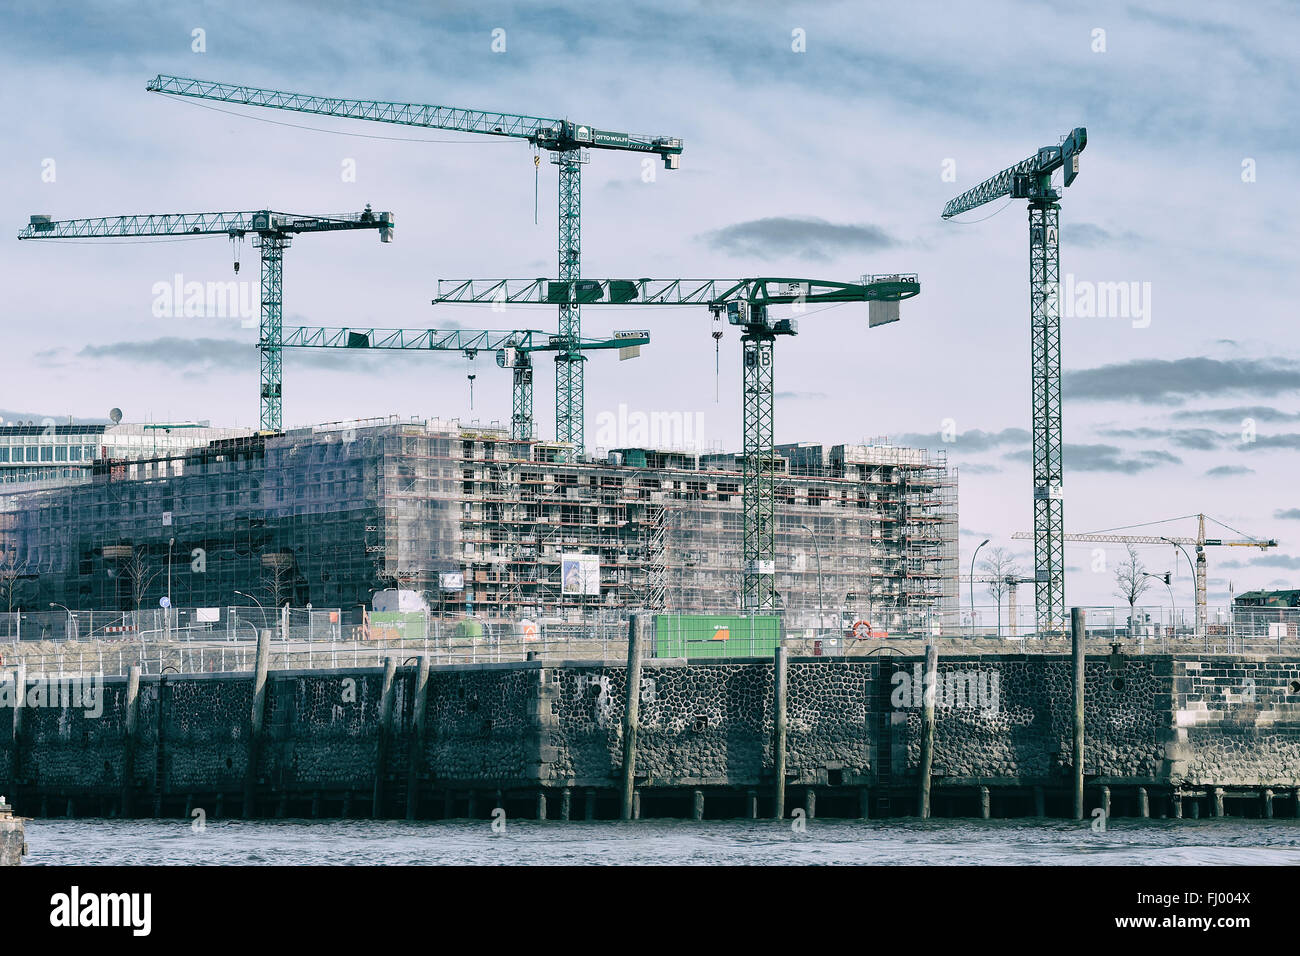 HAMBURG, Germany - modern development and construction at Hafencity - Stock Image